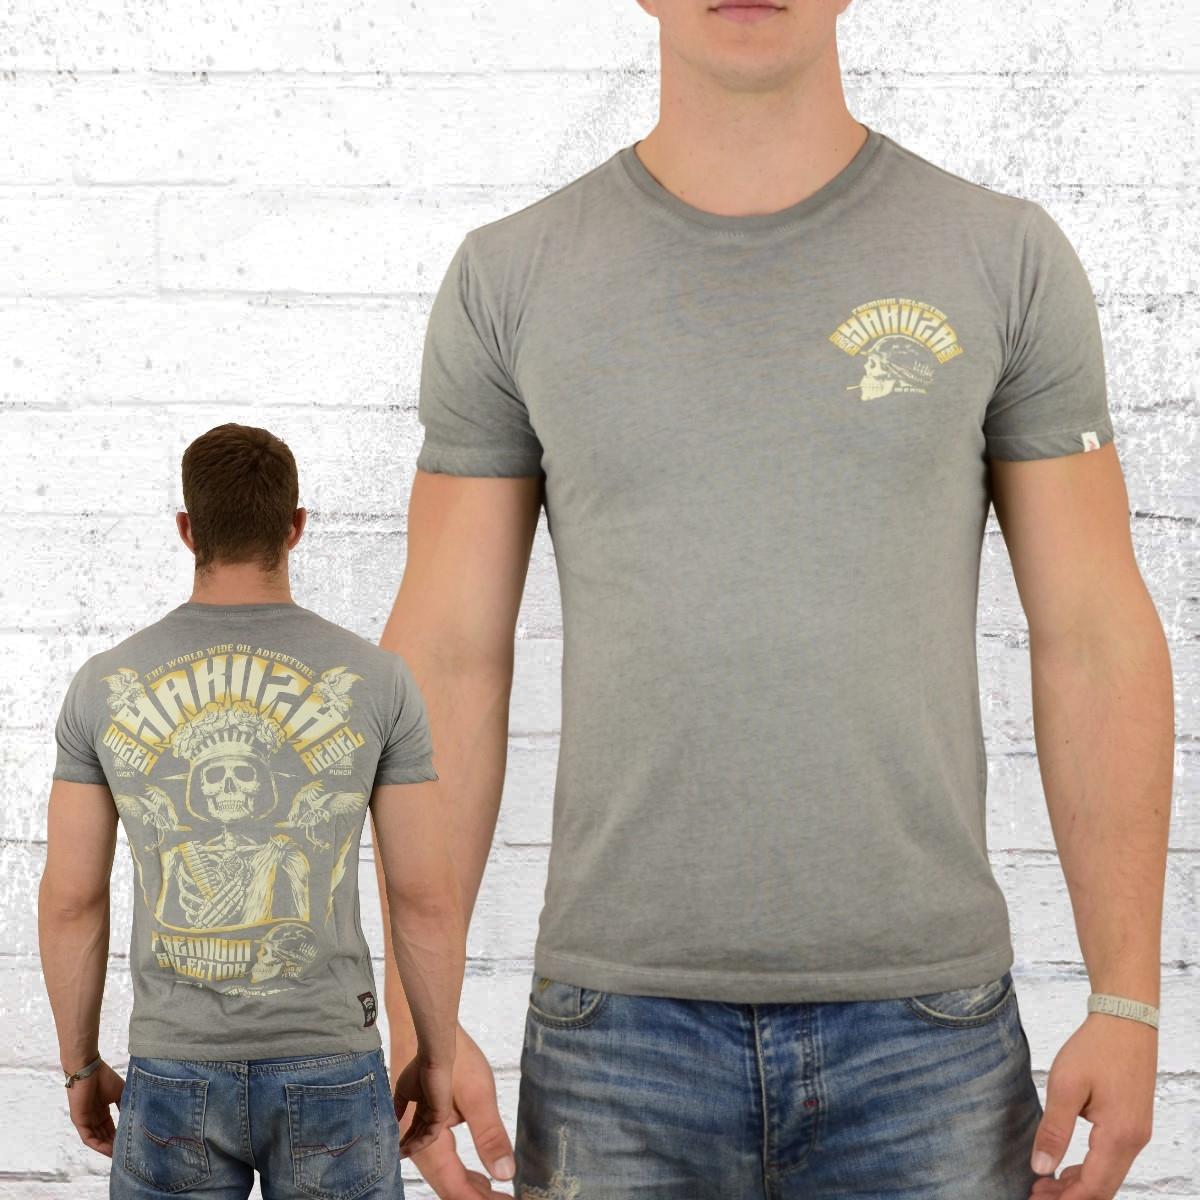 finest selection 61fd2 a3ba7 Order now | Yakuza Premium Male T-Shirt Skull King vintage grey